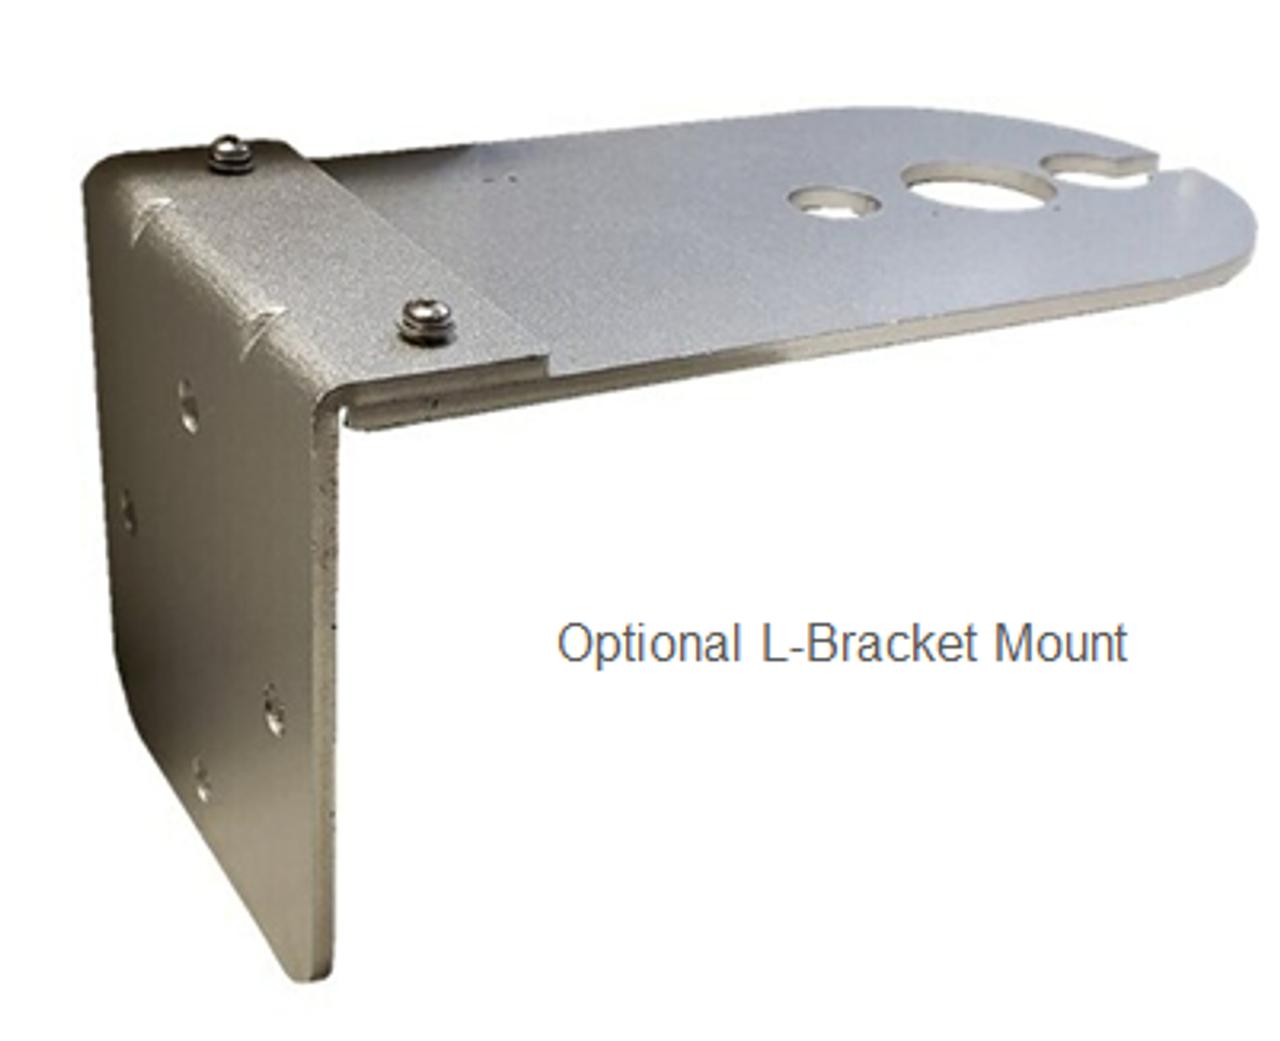 Optional L-Bracket Antenna Mount